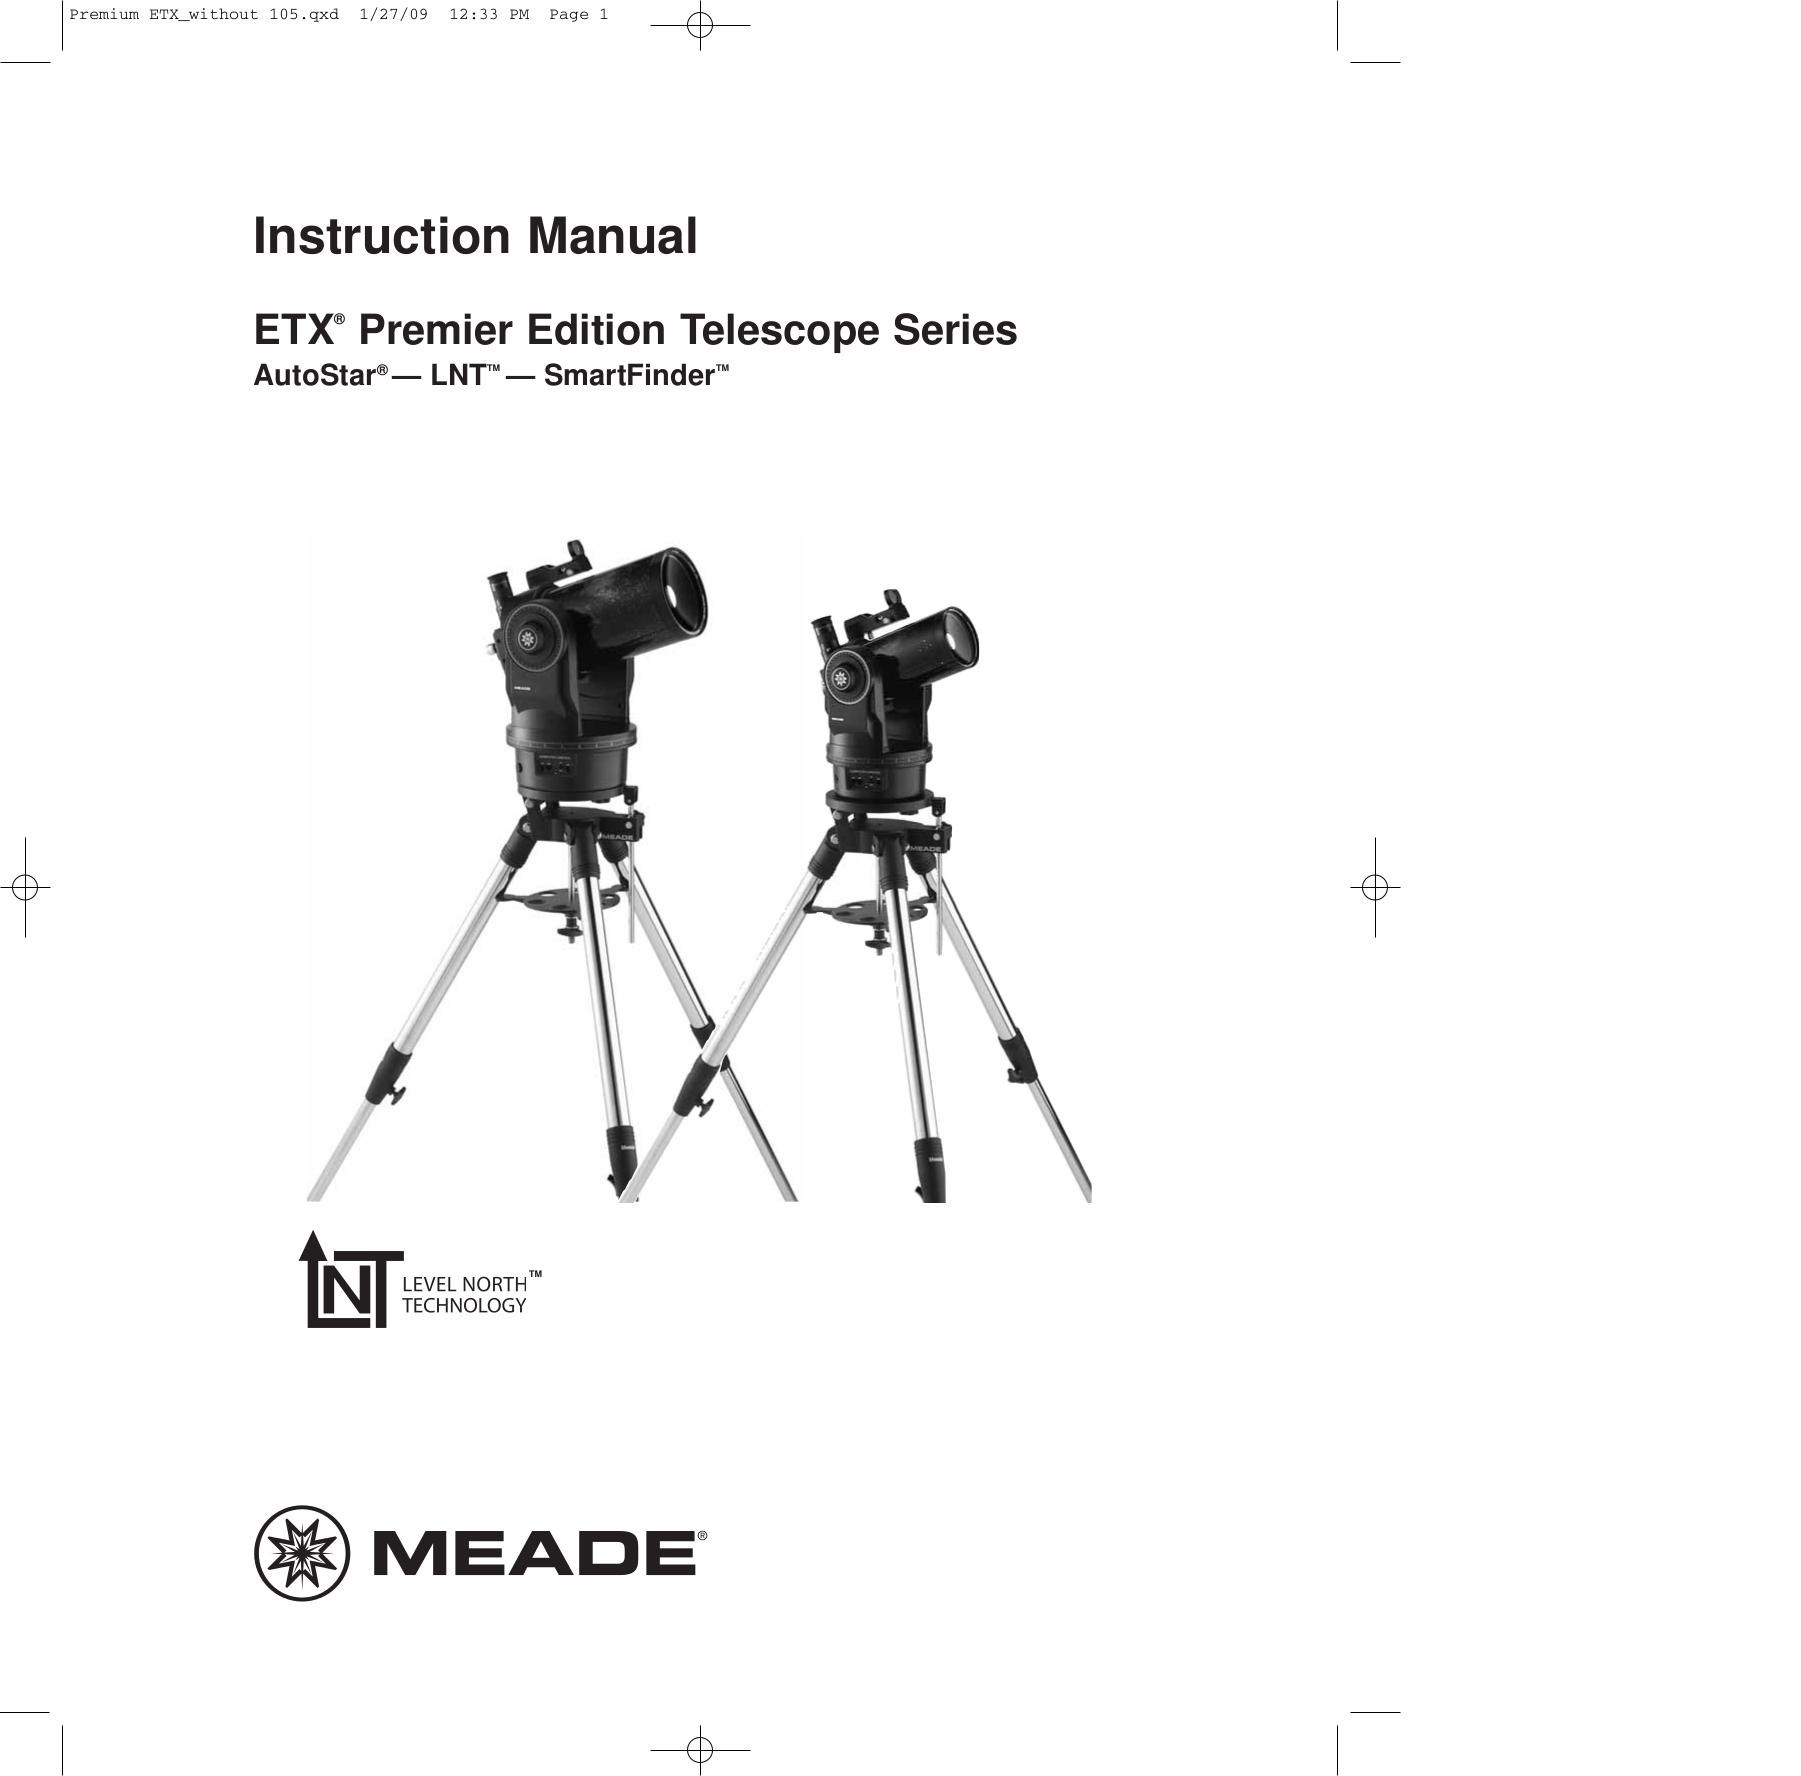 Meade etx-90ec instruction manual pdf download.